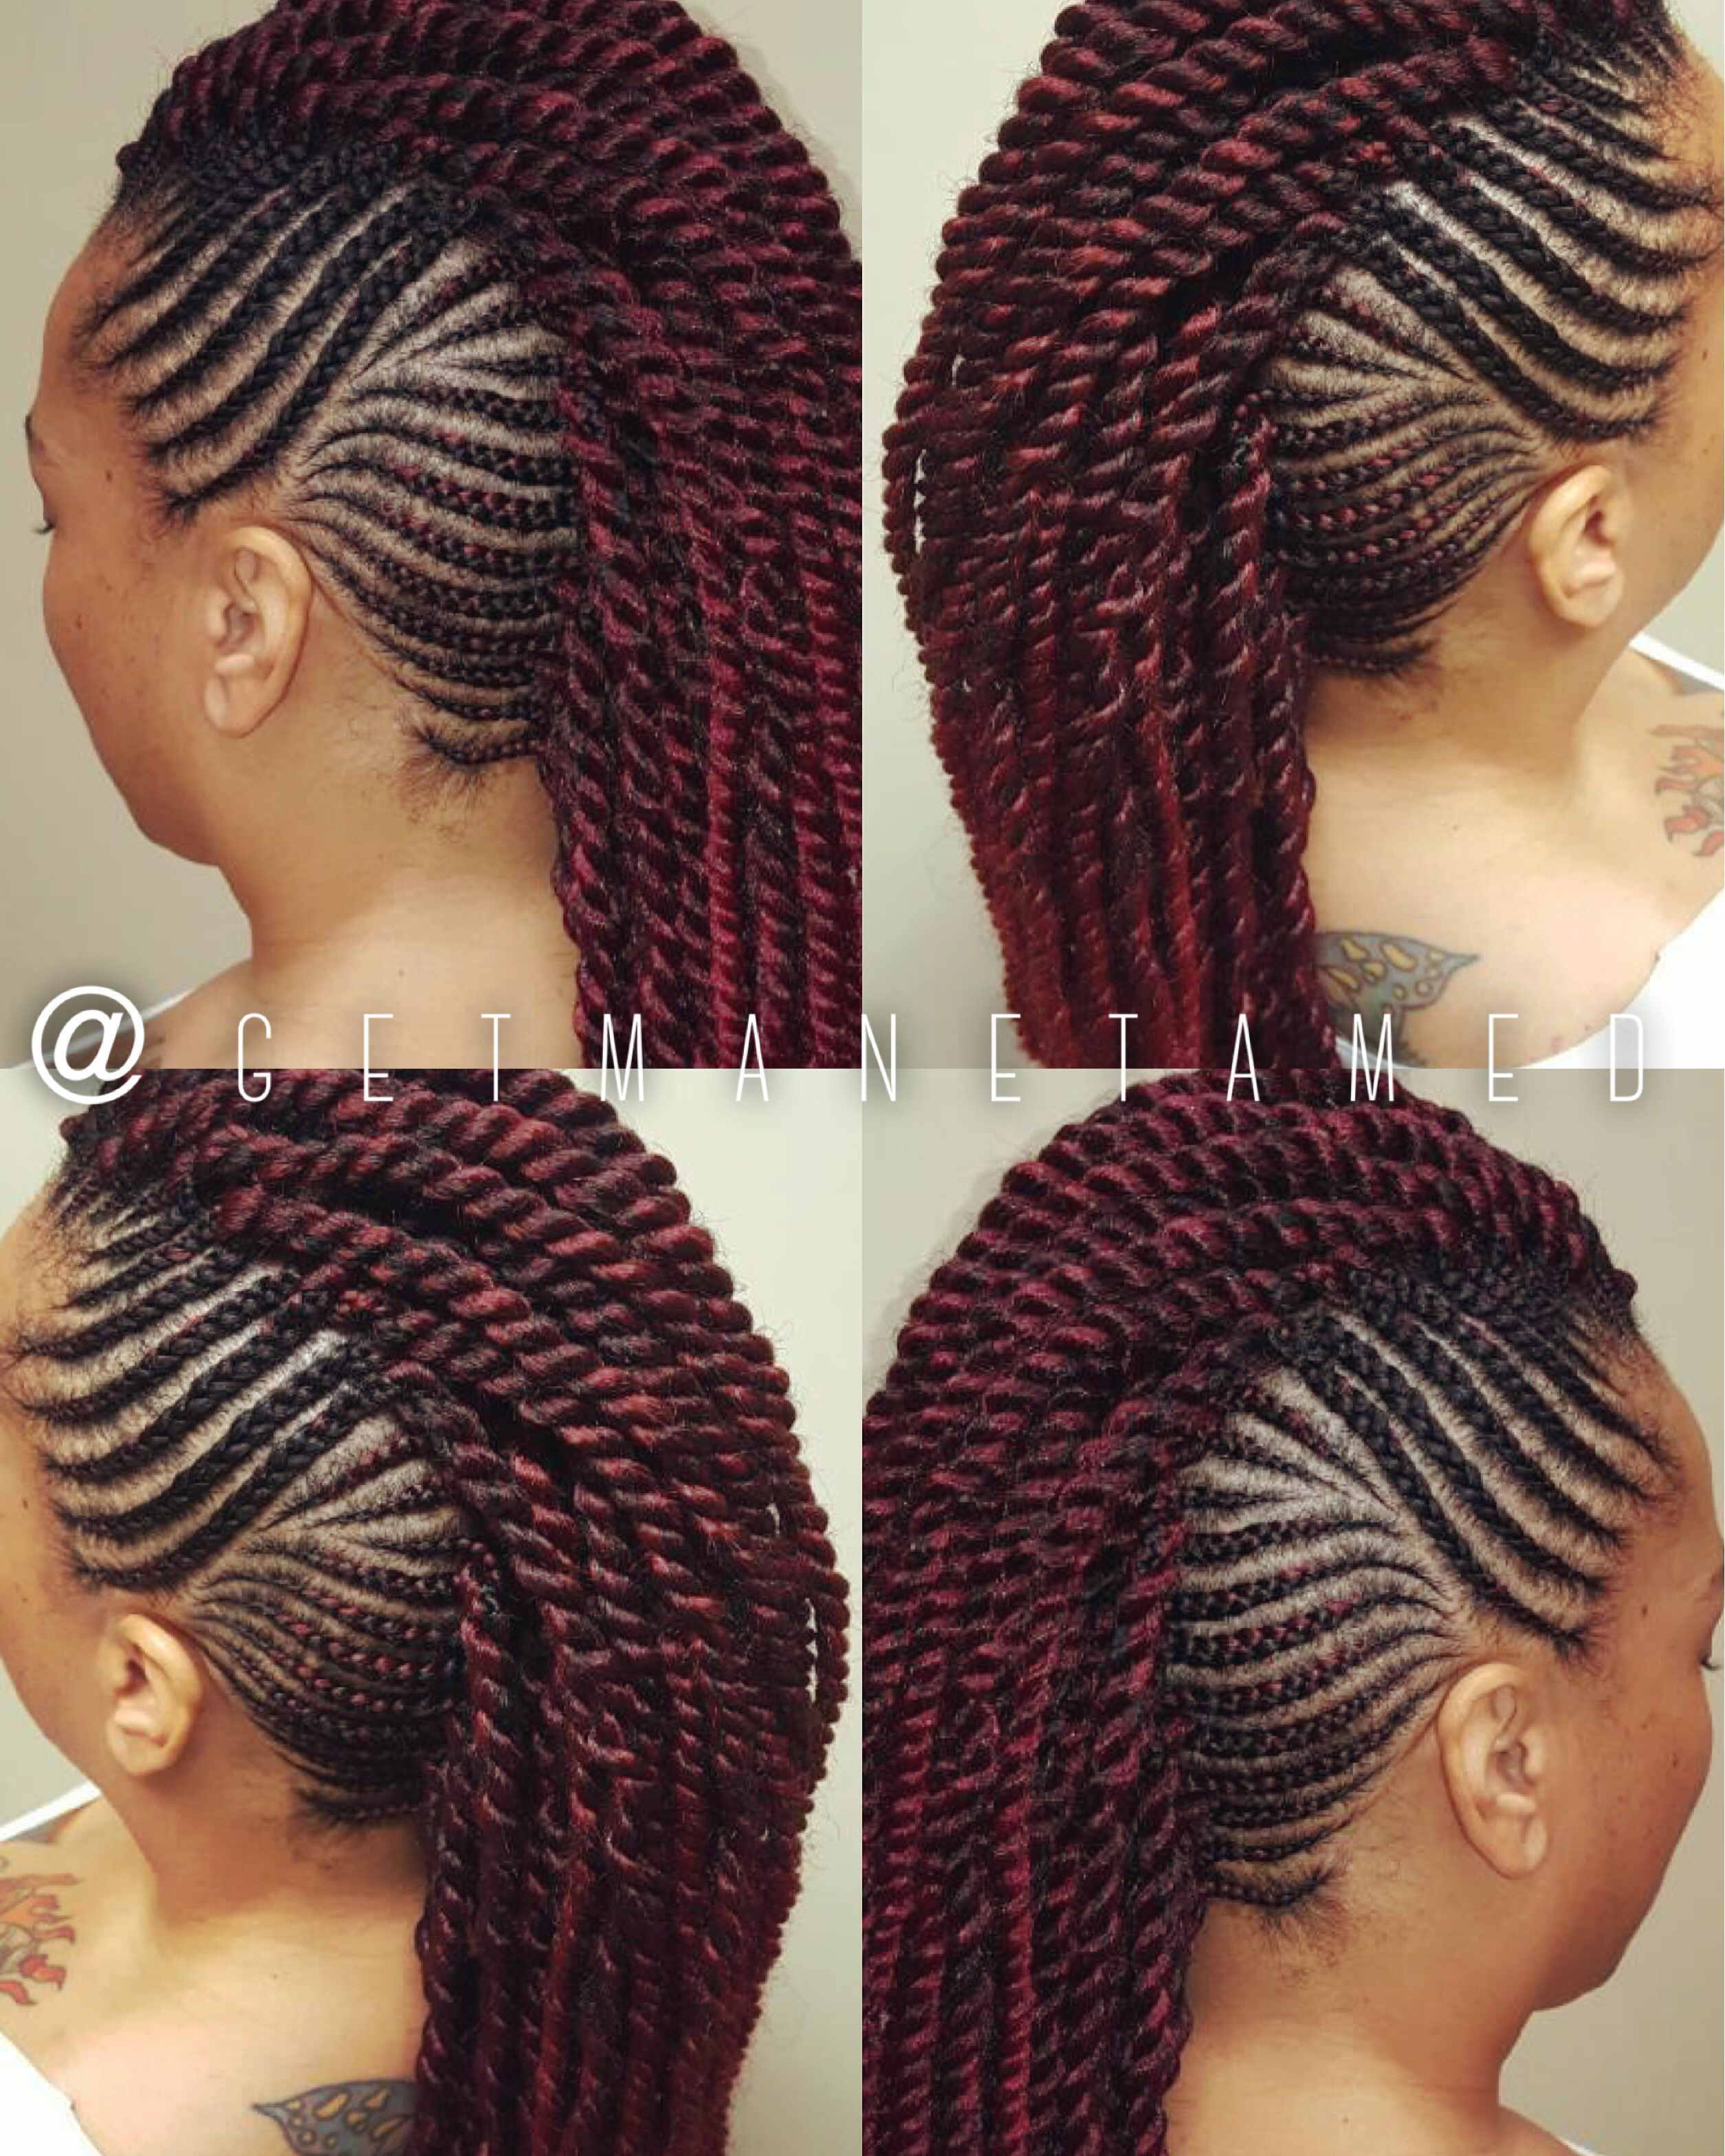 pin by eeba karanwi on braided mohawks in 2019 | hair styles